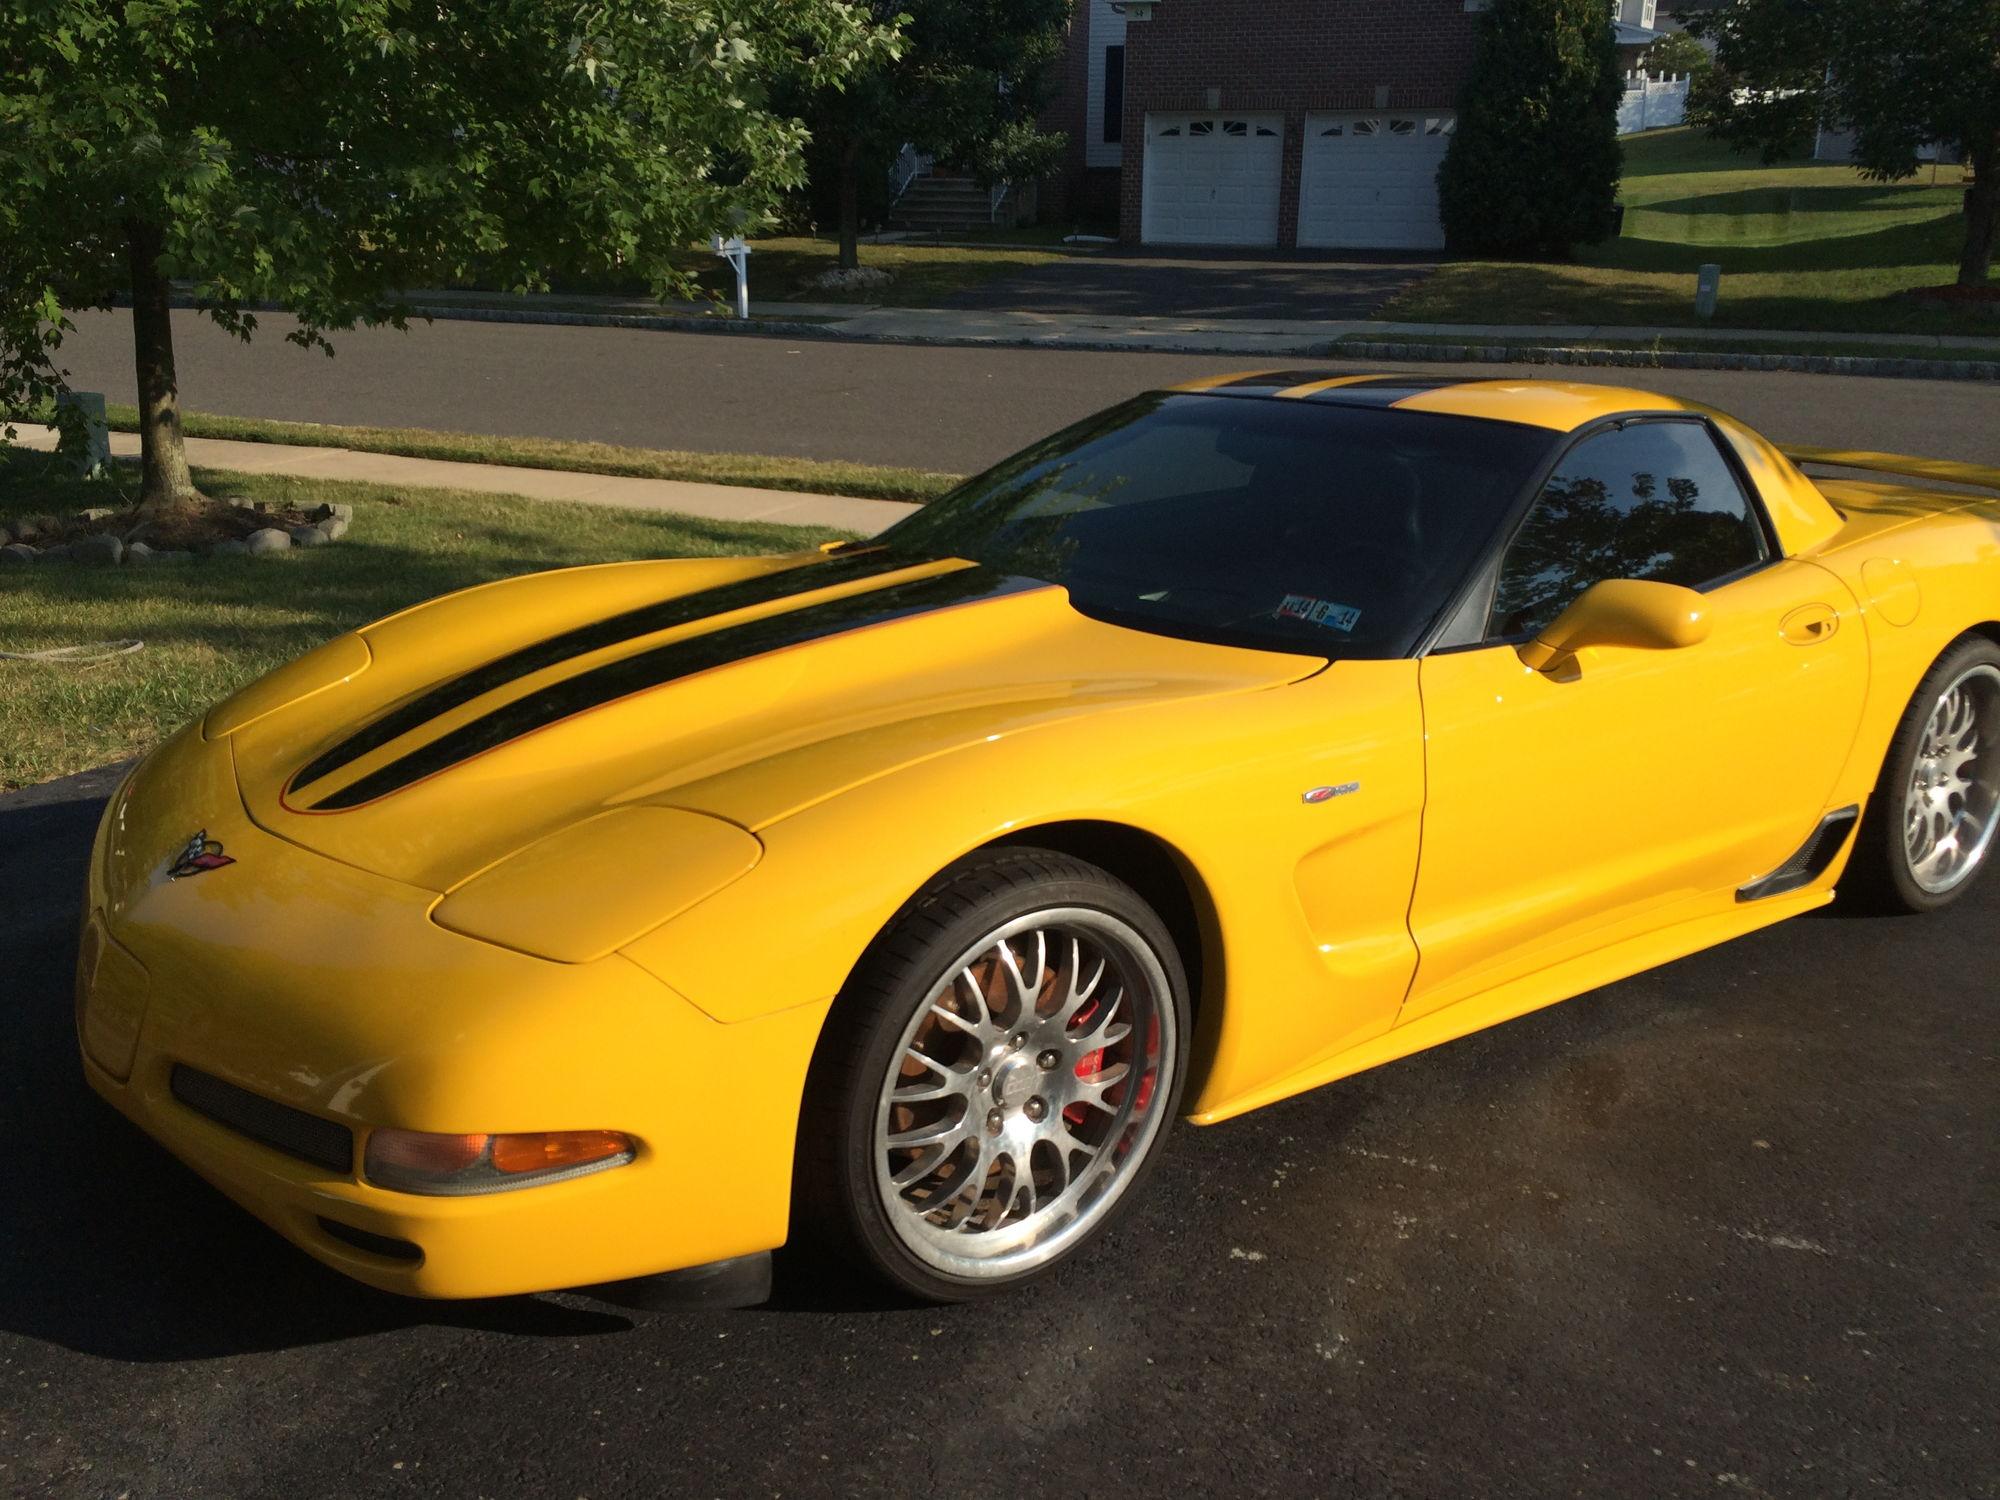 02 c5 z06 millenium yellow w stripes 36k miles asking 22k corvetteforum chevrolet corvette. Black Bedroom Furniture Sets. Home Design Ideas